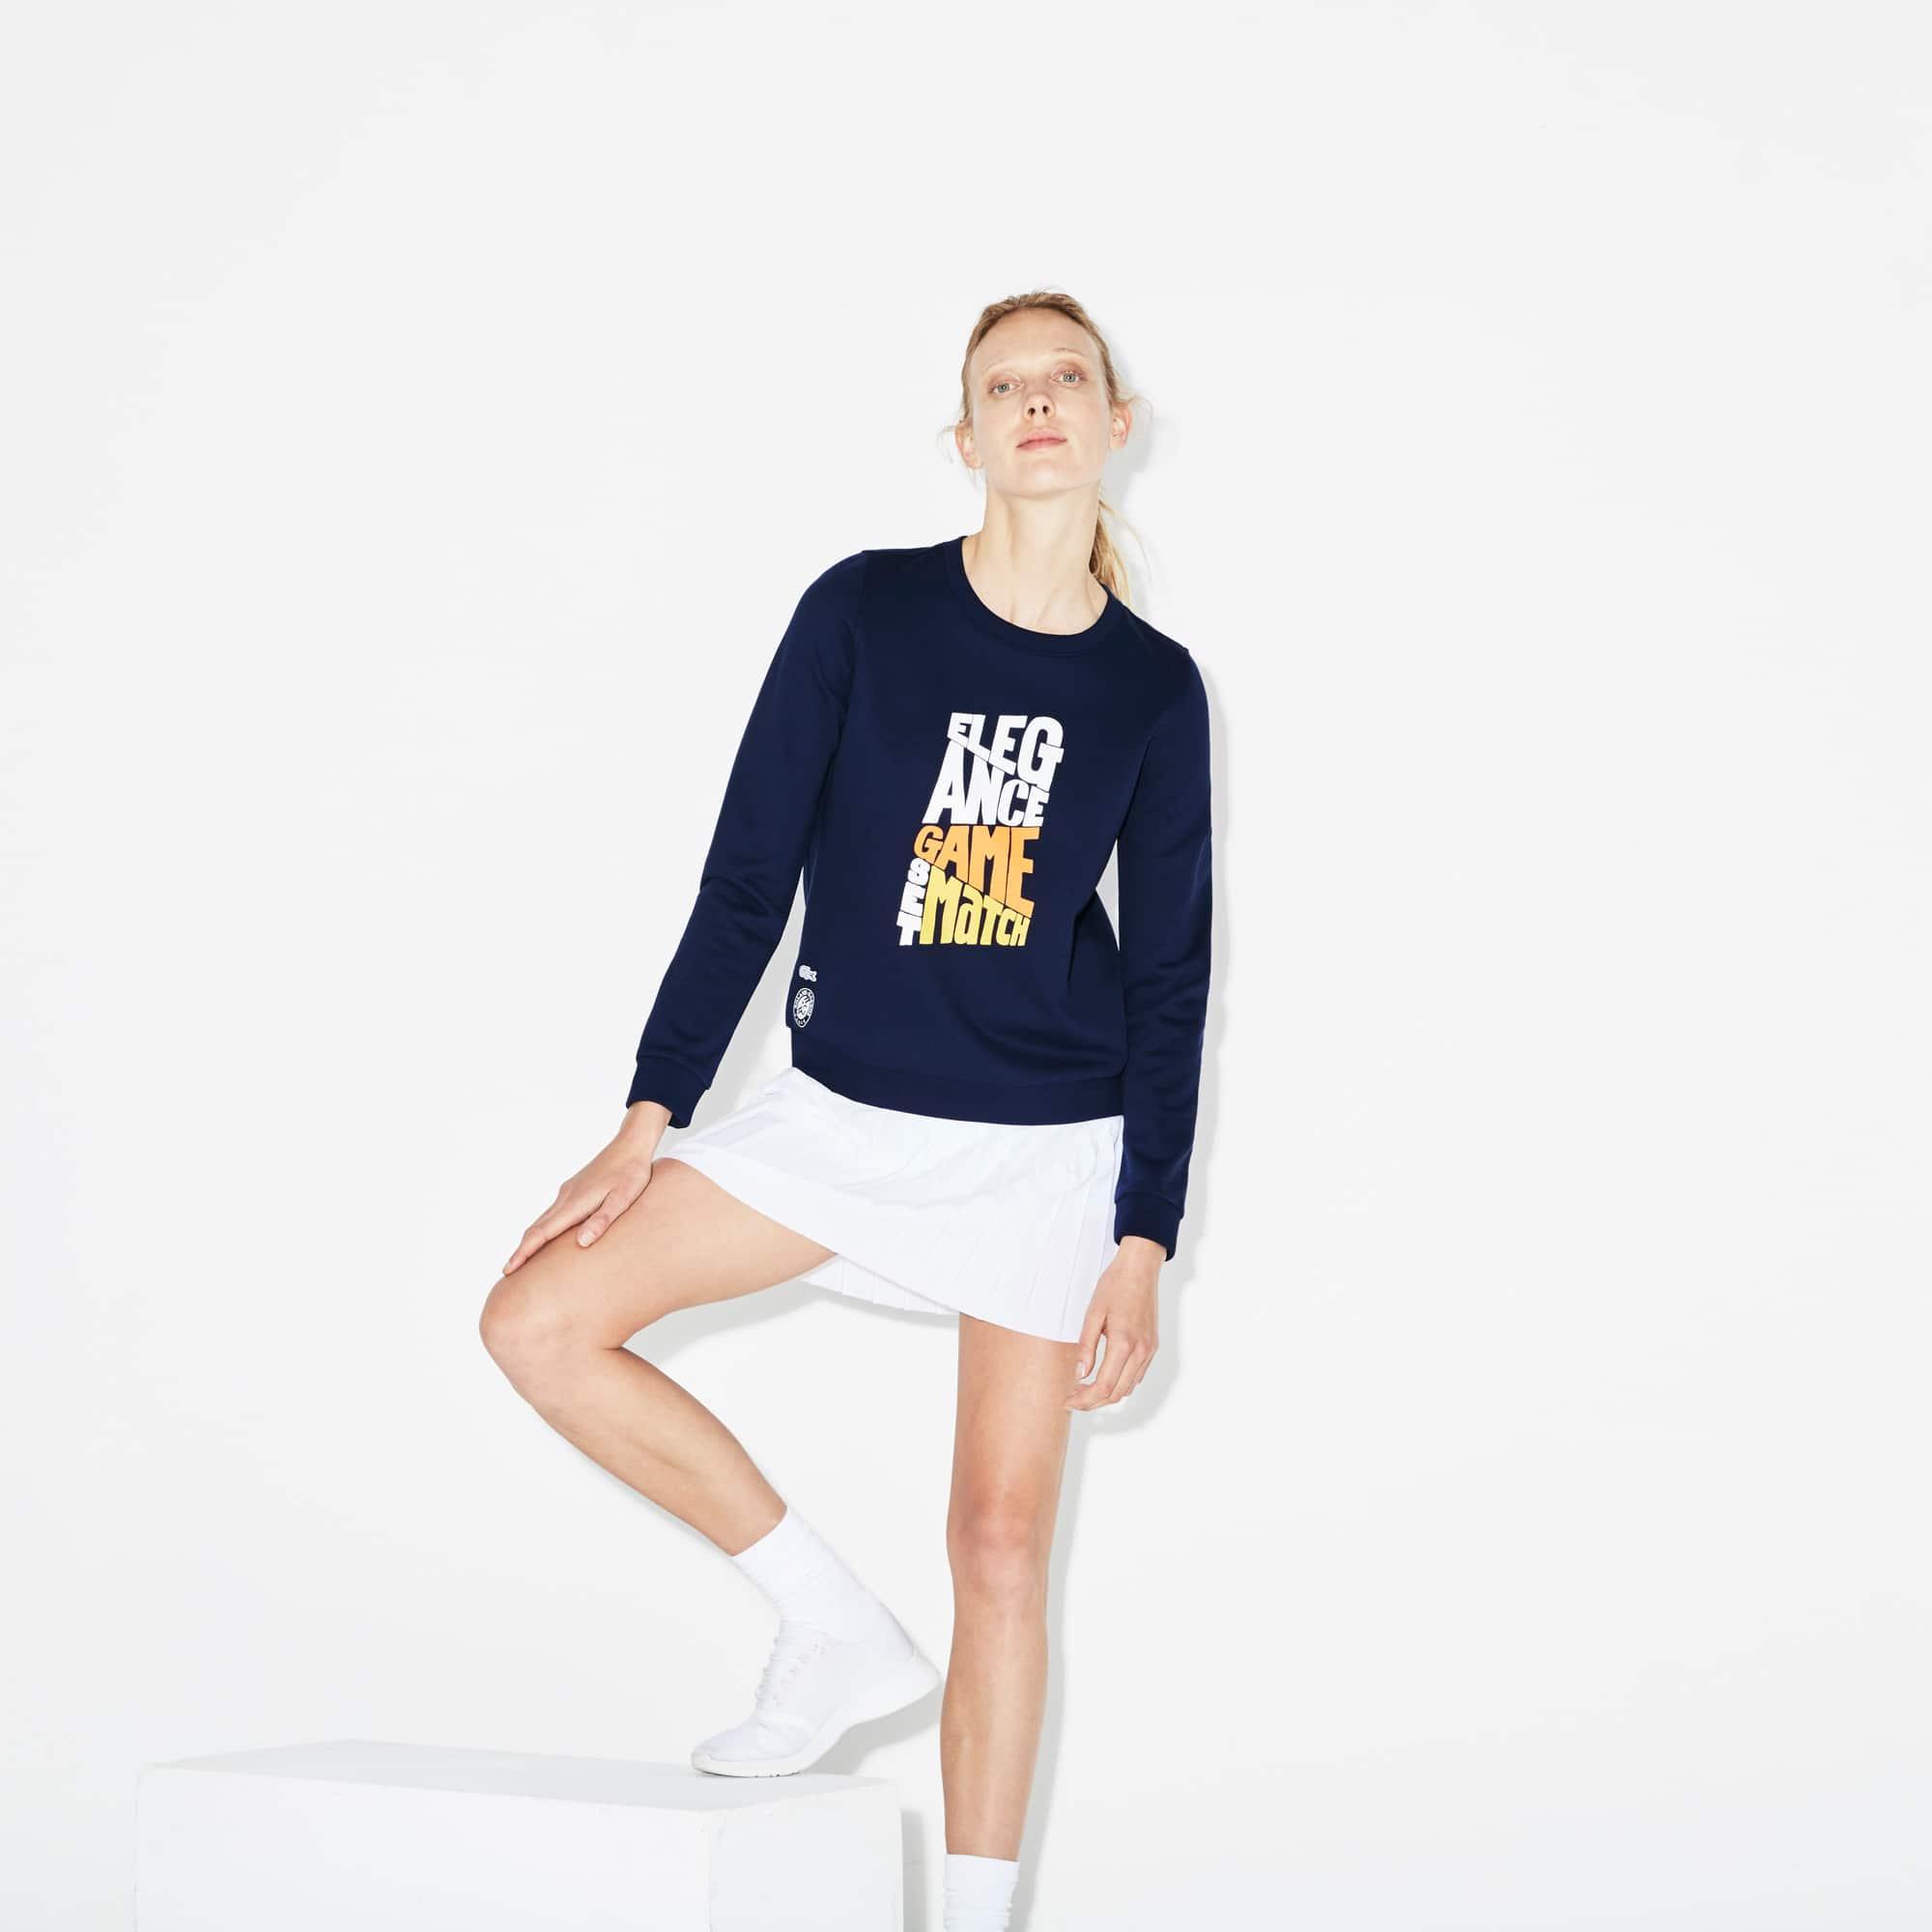 Women's Lacoste SPORT Roland Garros Edition Design Fleece Sweatshirt